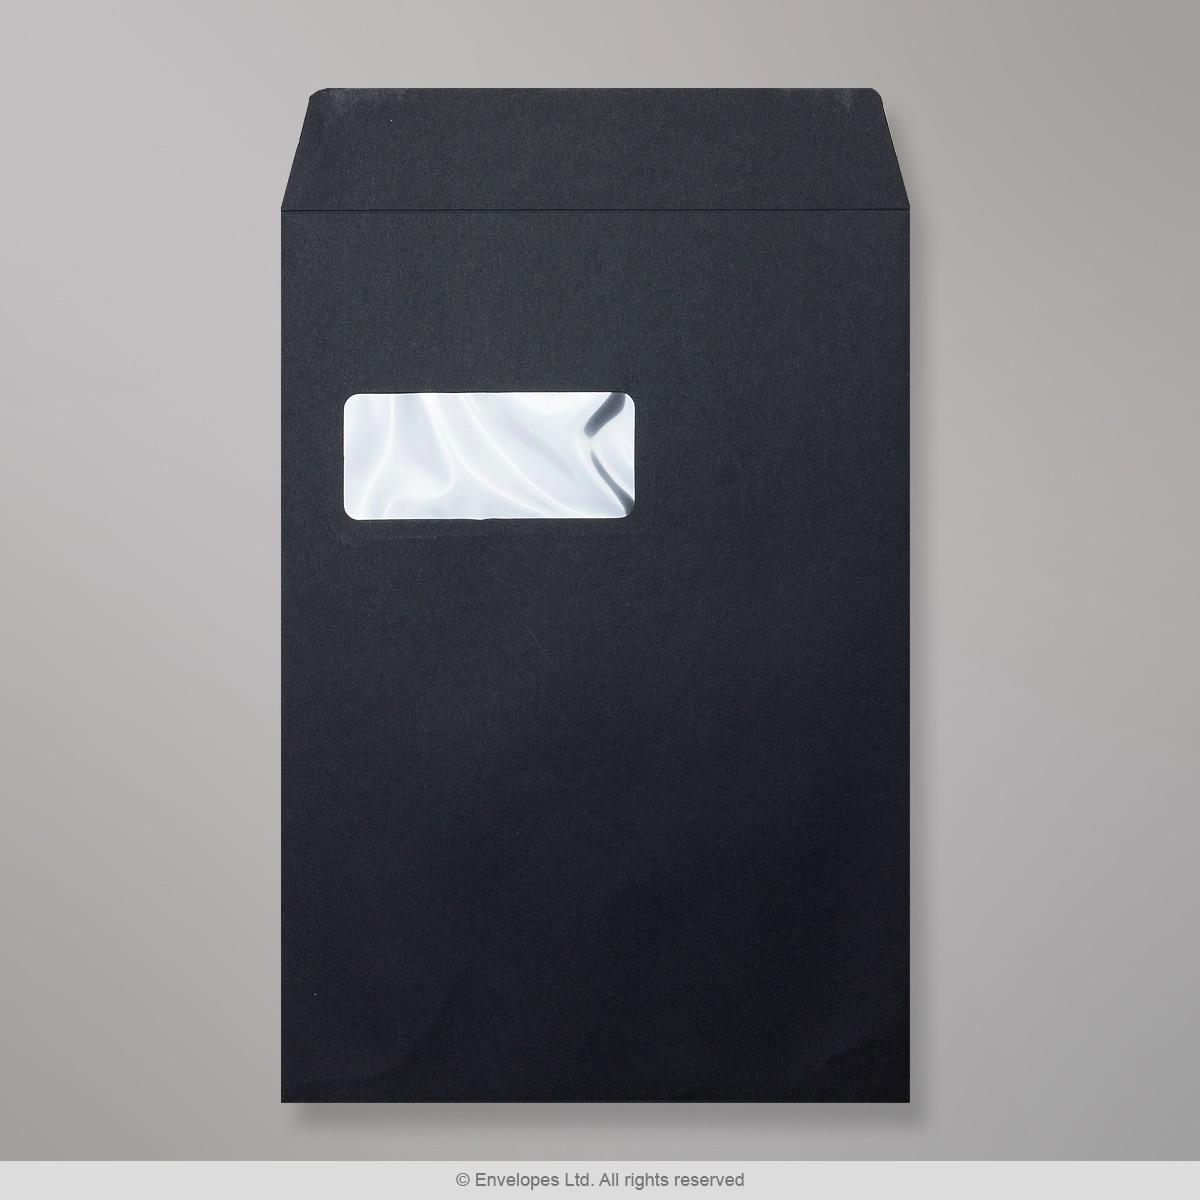 324x229 mm (C4) Busta Post Marque nera - con finestra